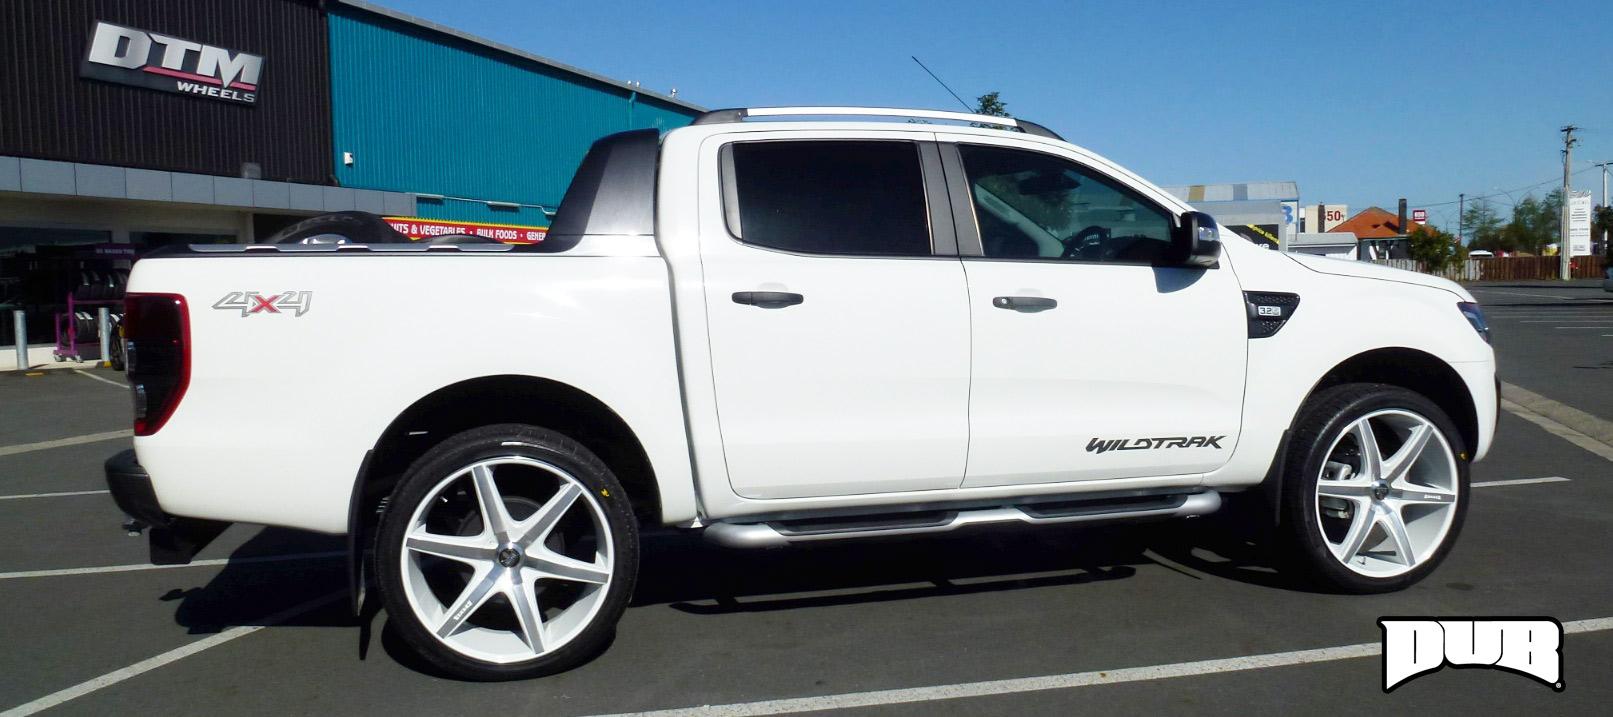 Ford Ranger Rio 6 - S113 Gallery - MHT Wheels Inc.